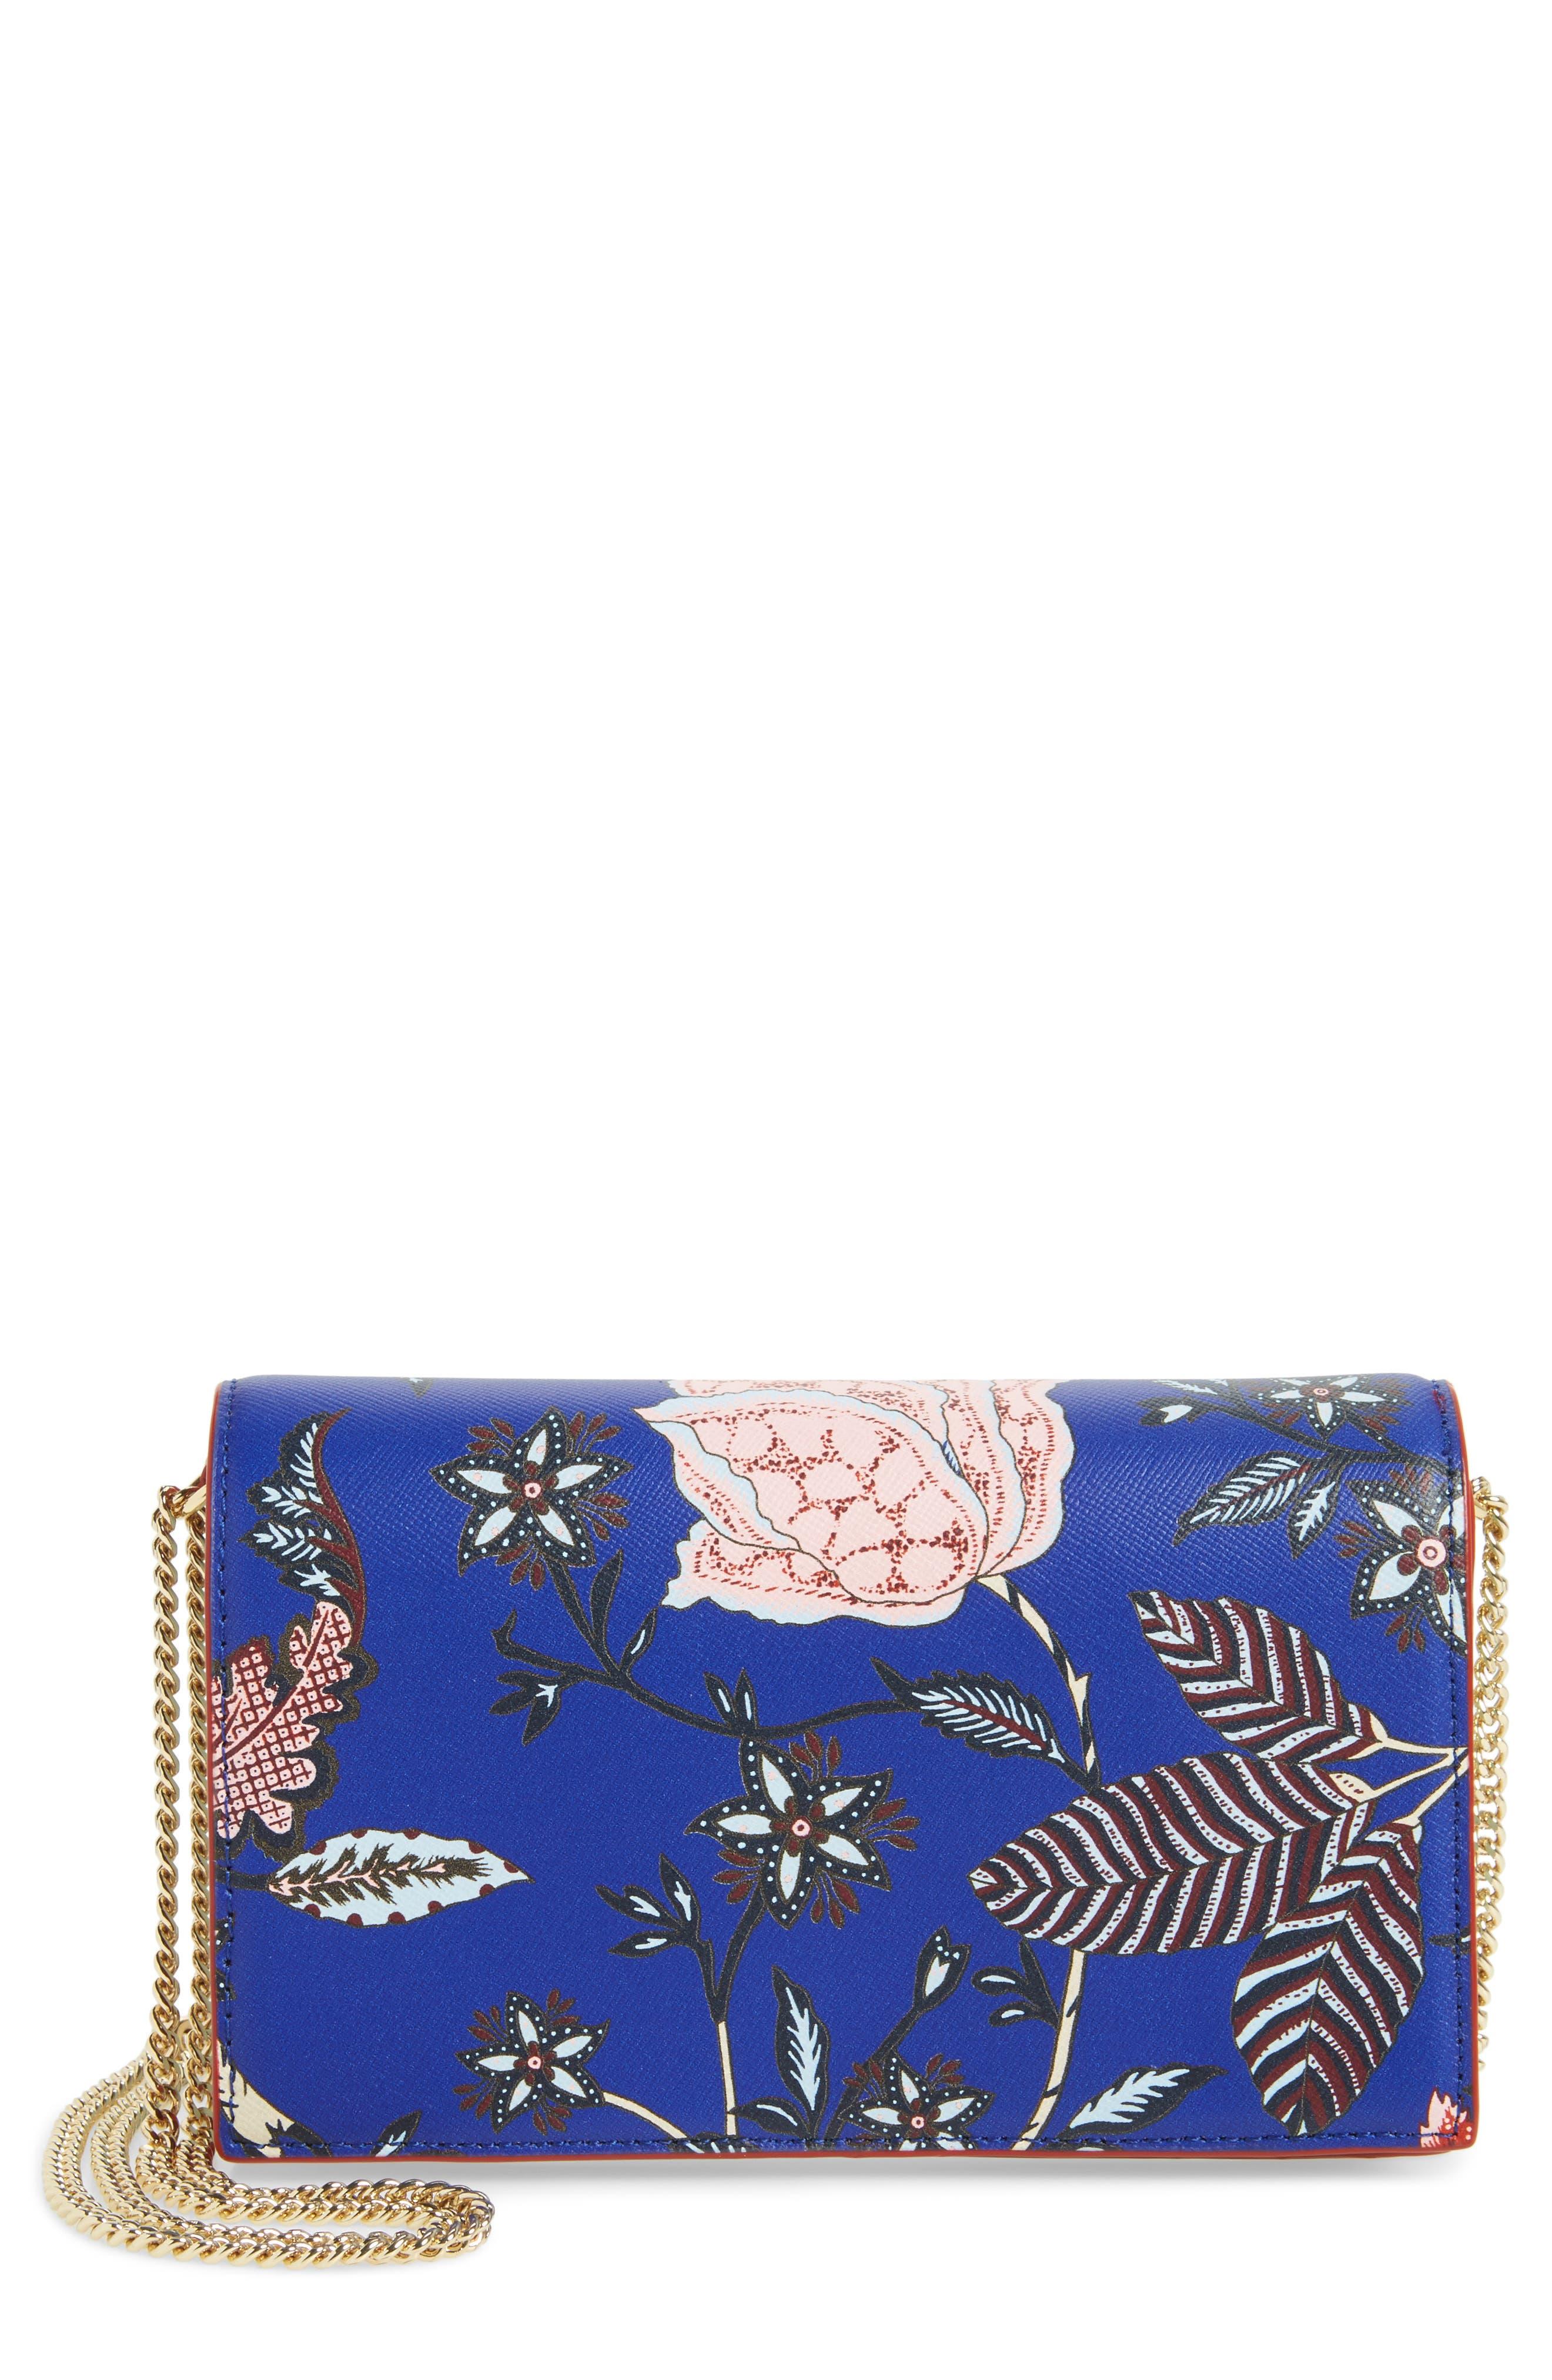 Alternate Image 1 Selected - Diane von Furstenberg Soirée Leather Convertible Crossbody Bag